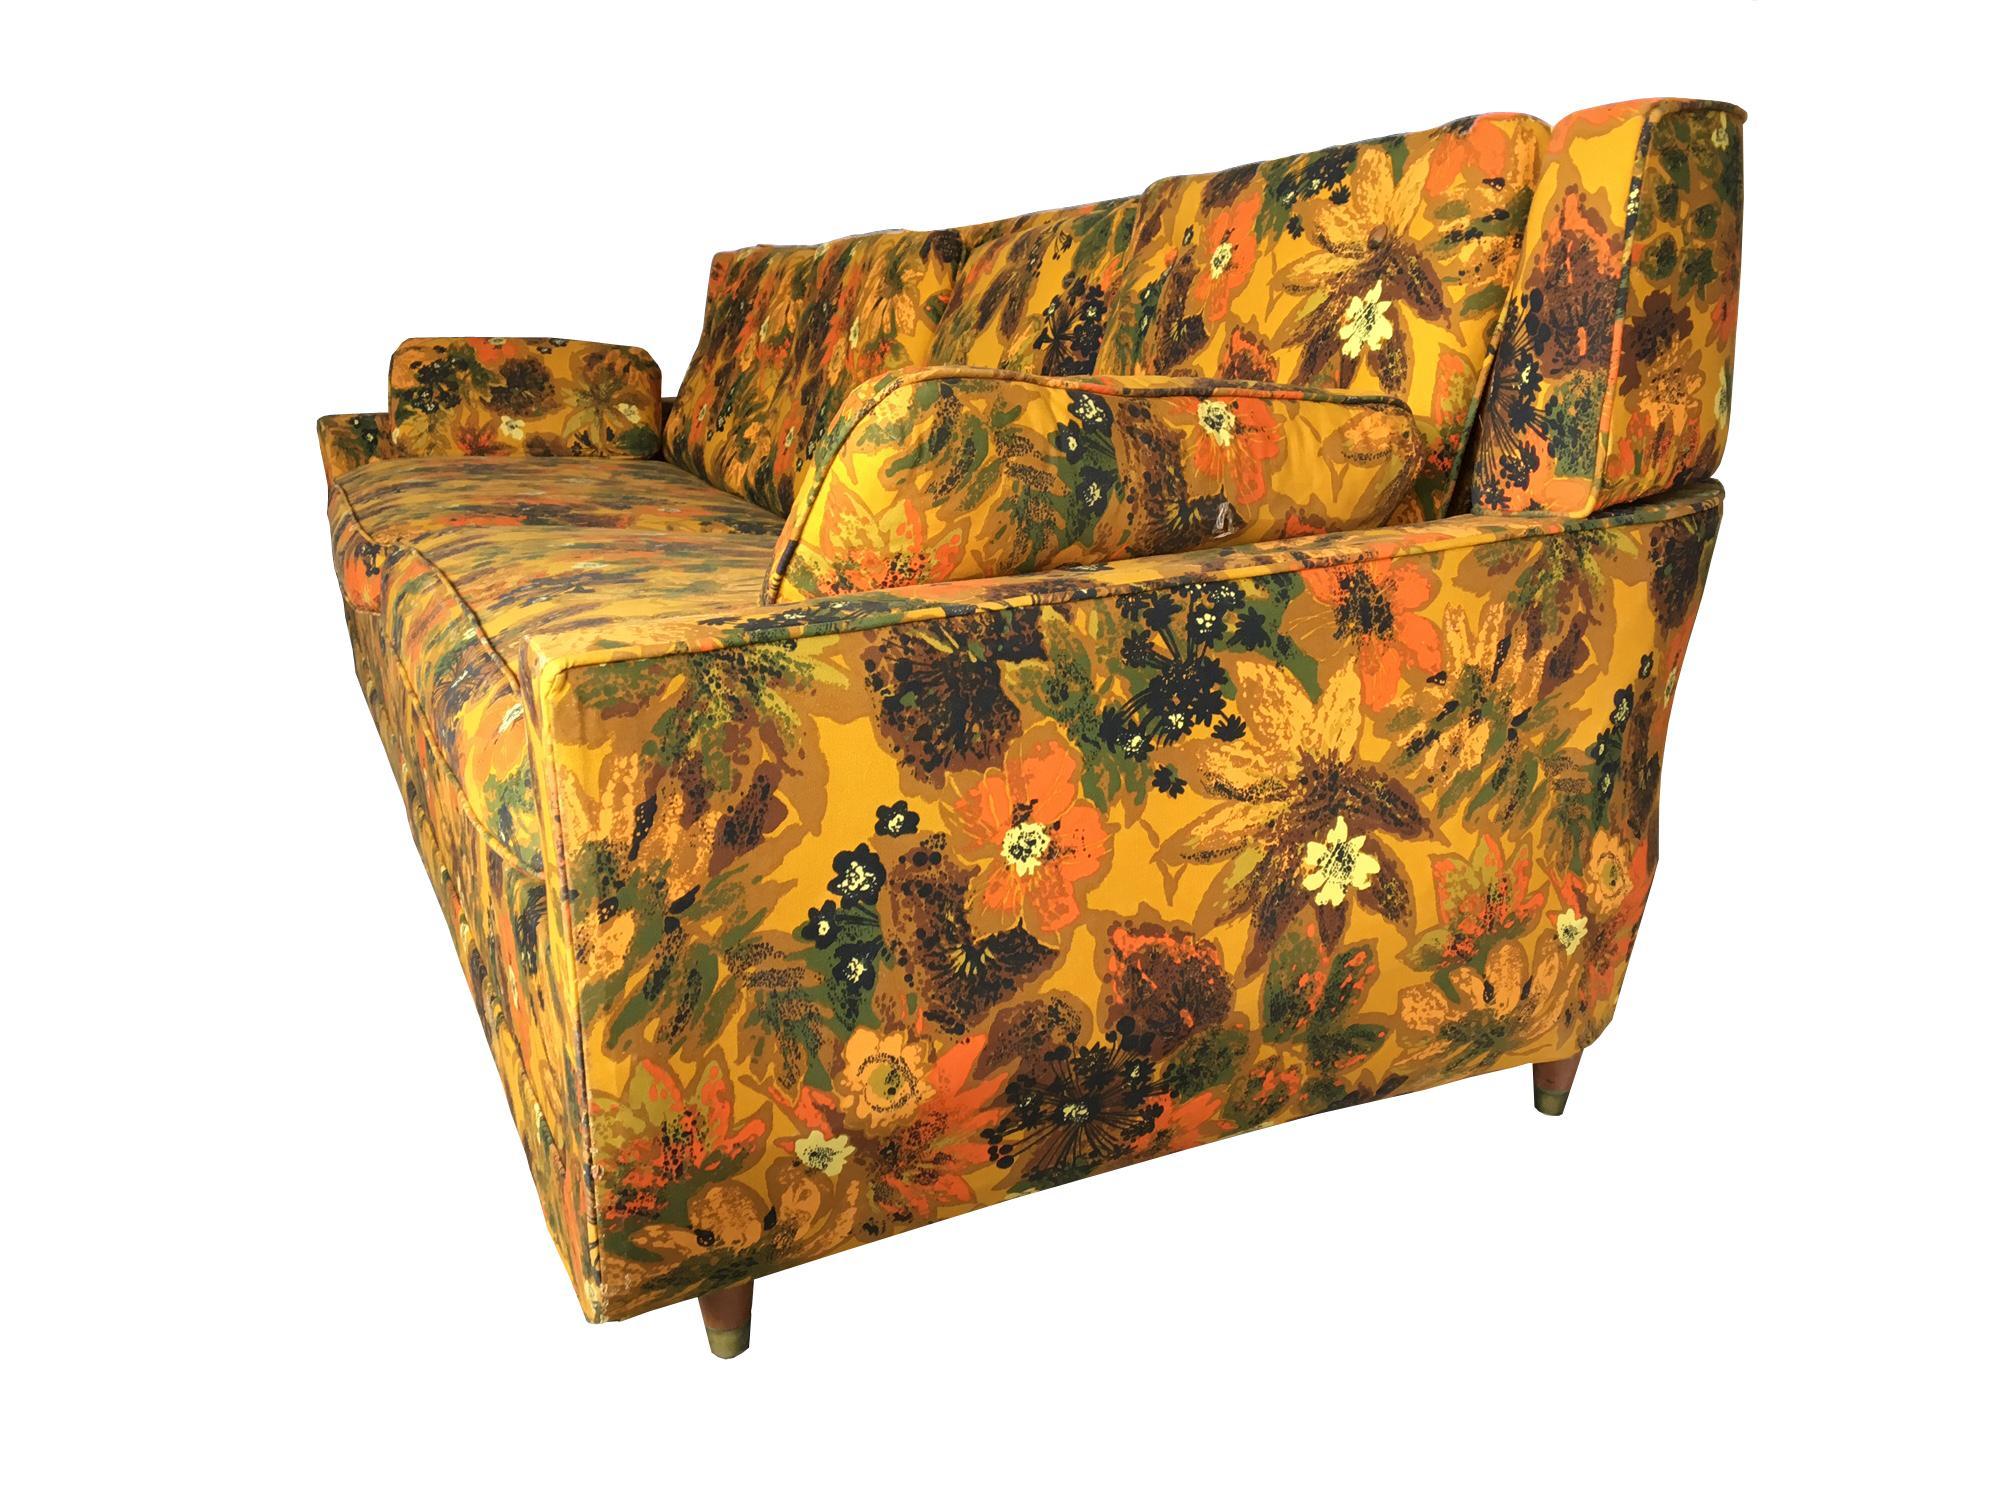 1967 Vintage Bernard Castro Mid Century Modern Floral Sleeper Sofa